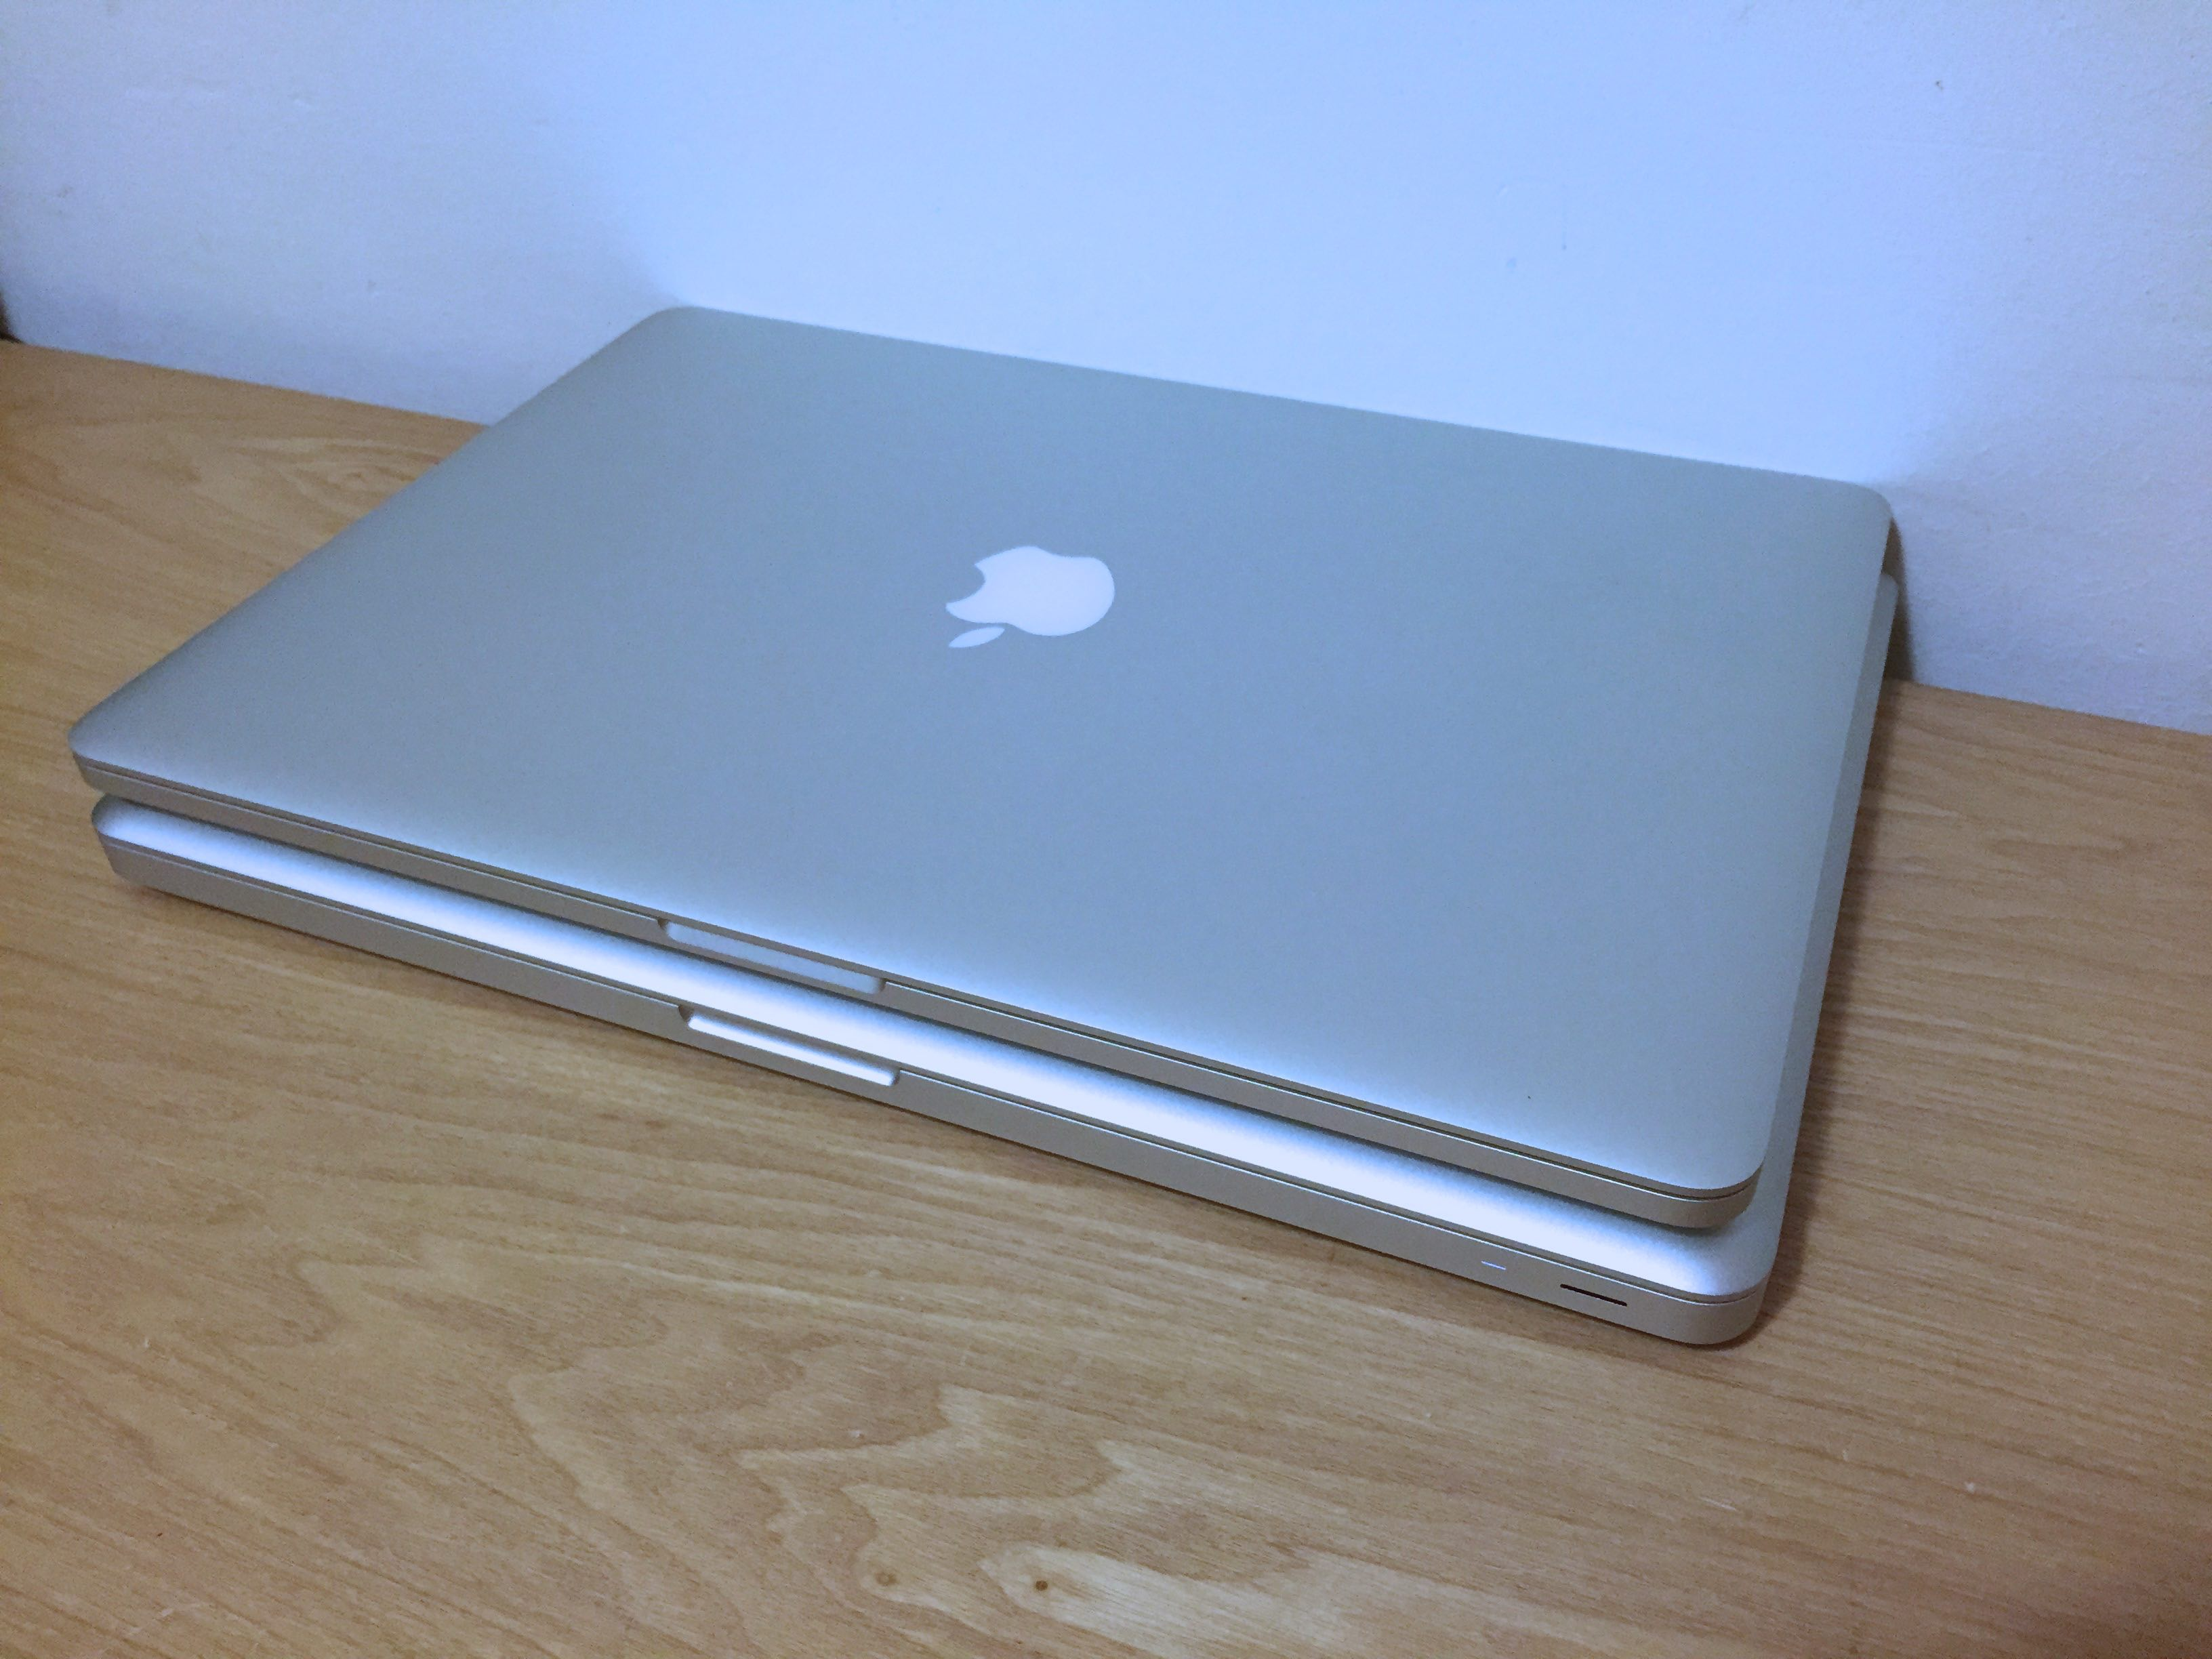 Difference macbook pro macbook pro retina00009